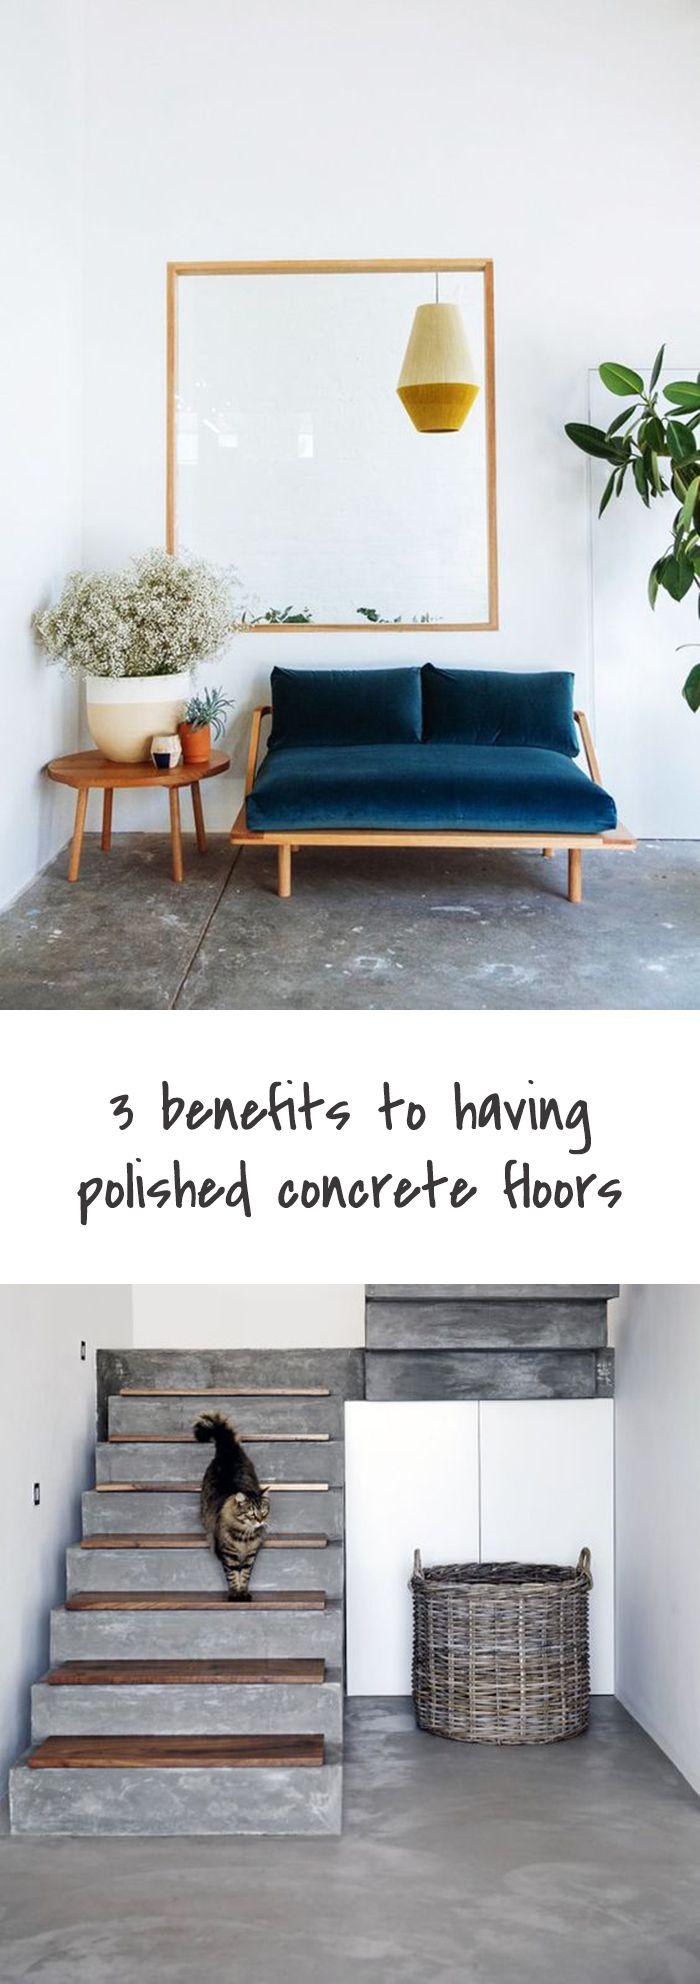 3 Benefits to having polished concrete floors | Polished ...